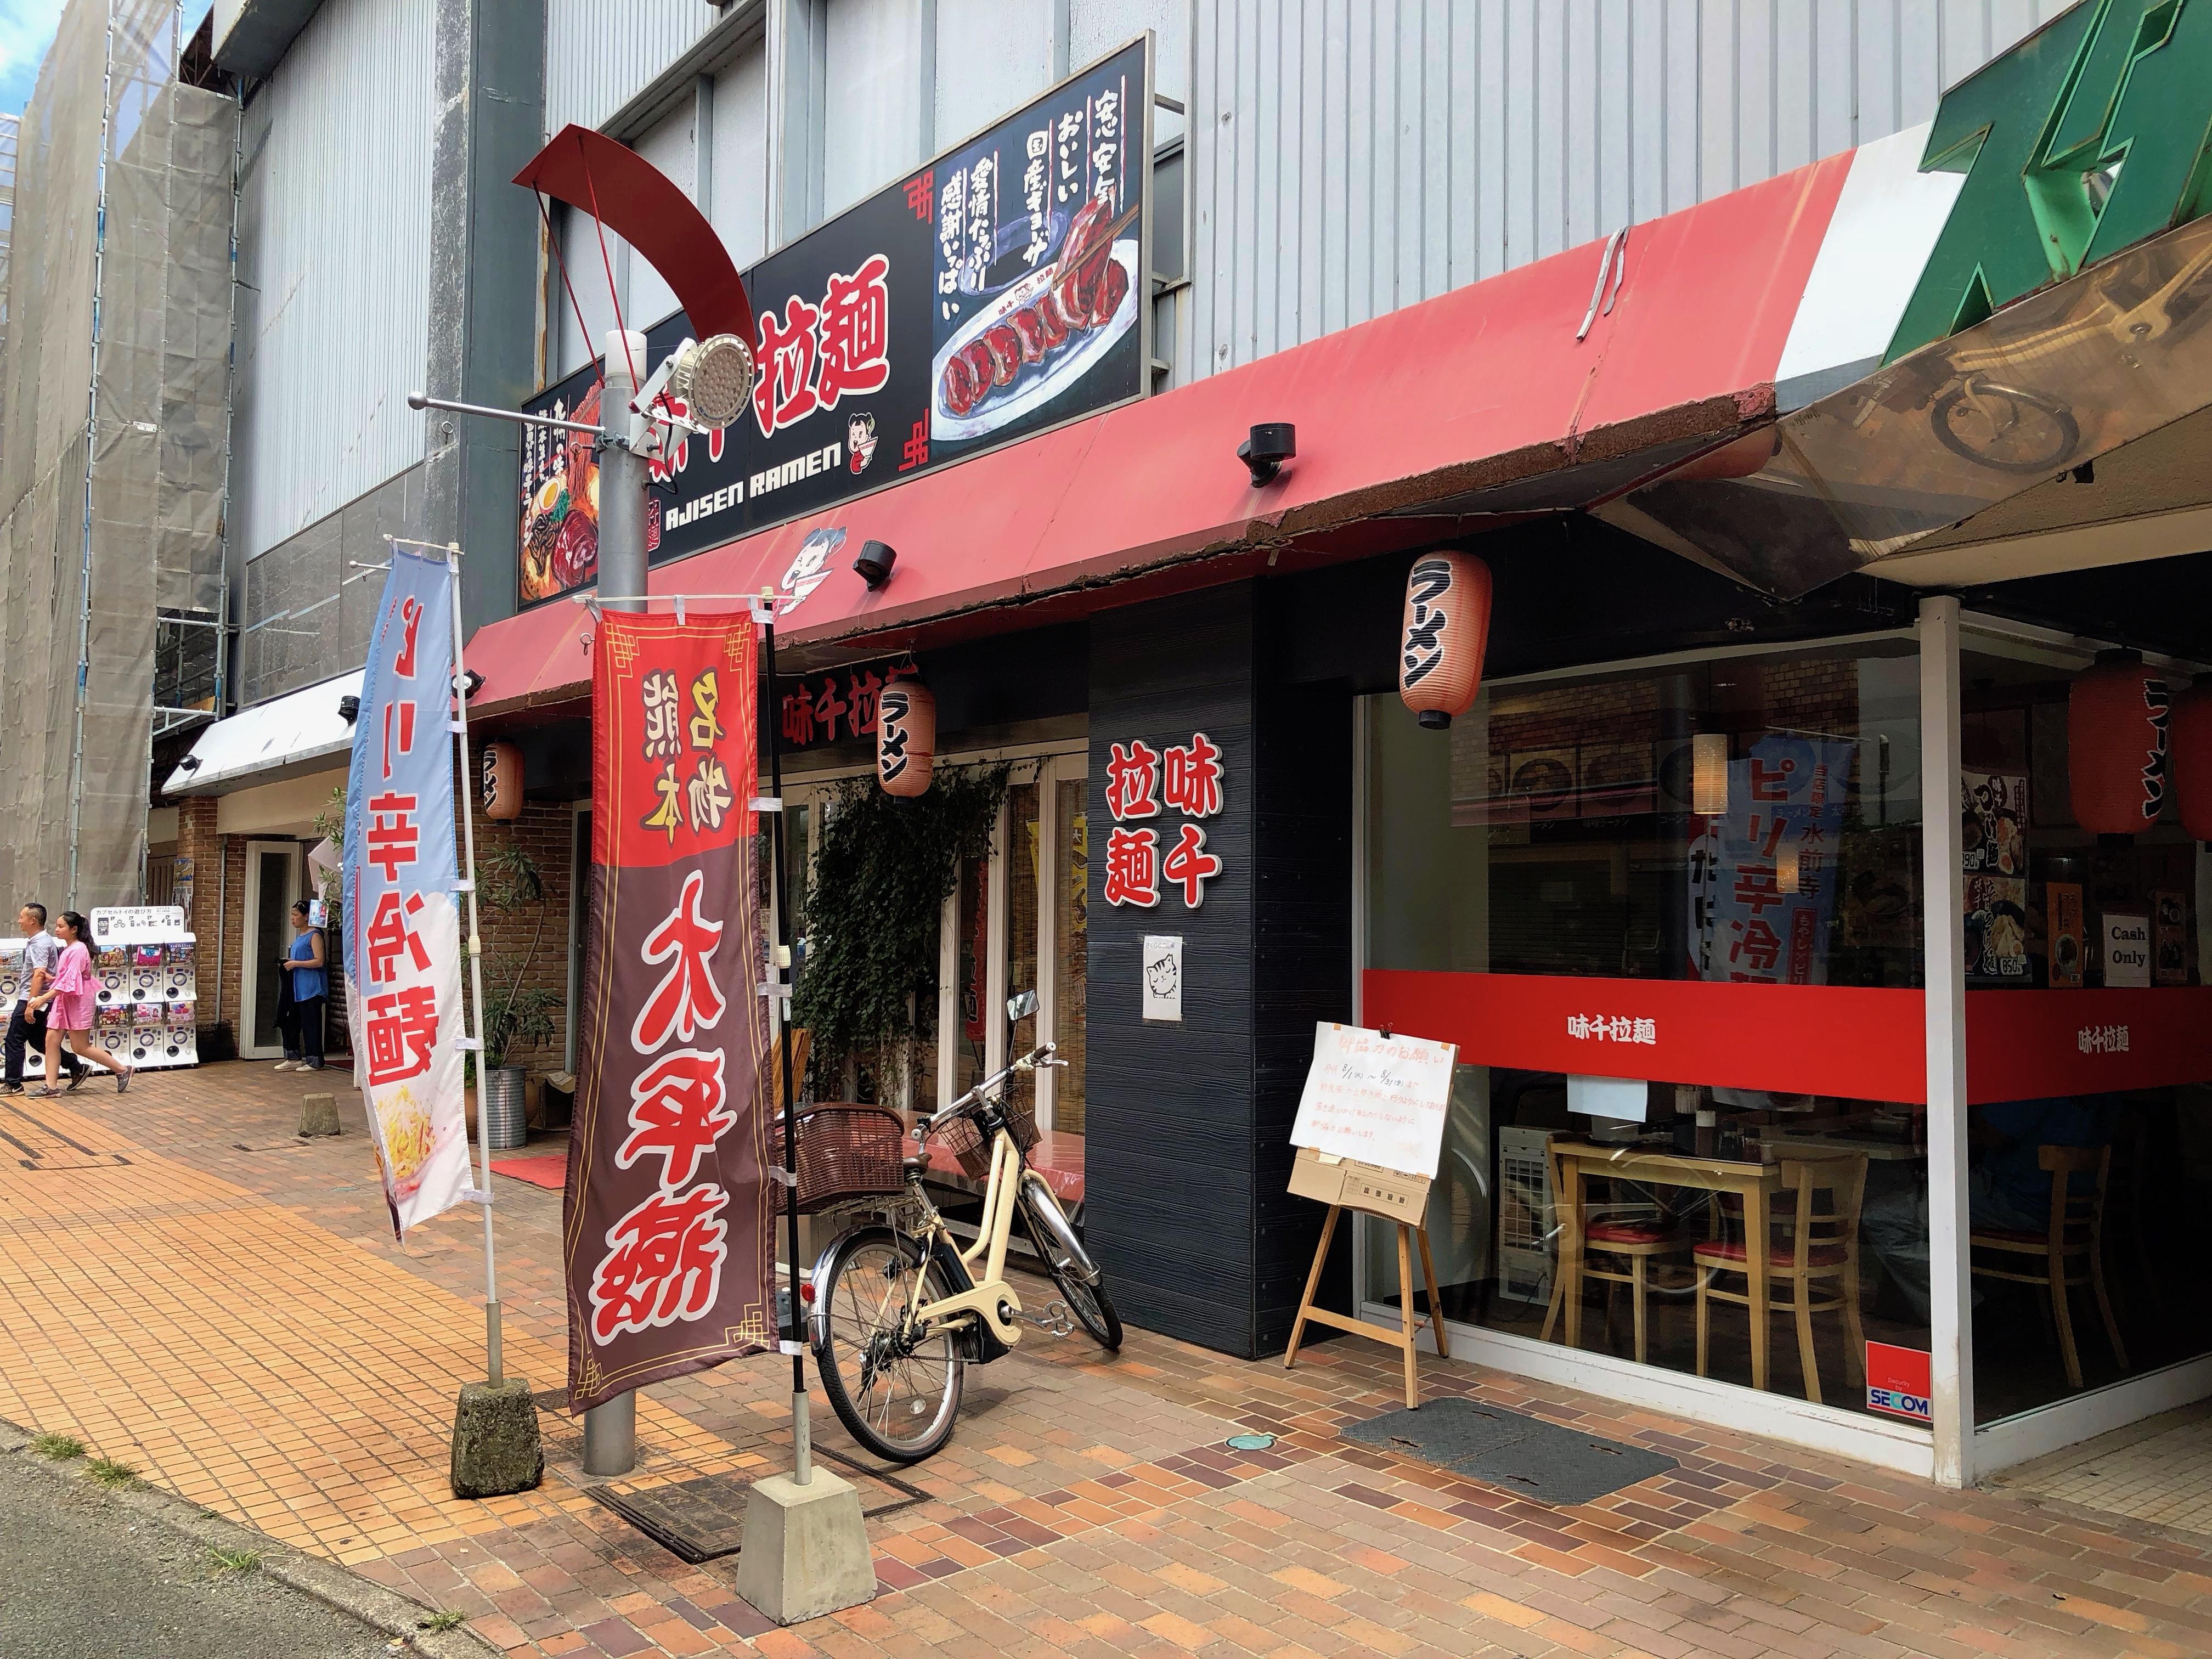 kumamoto city, Japan, 2018 34